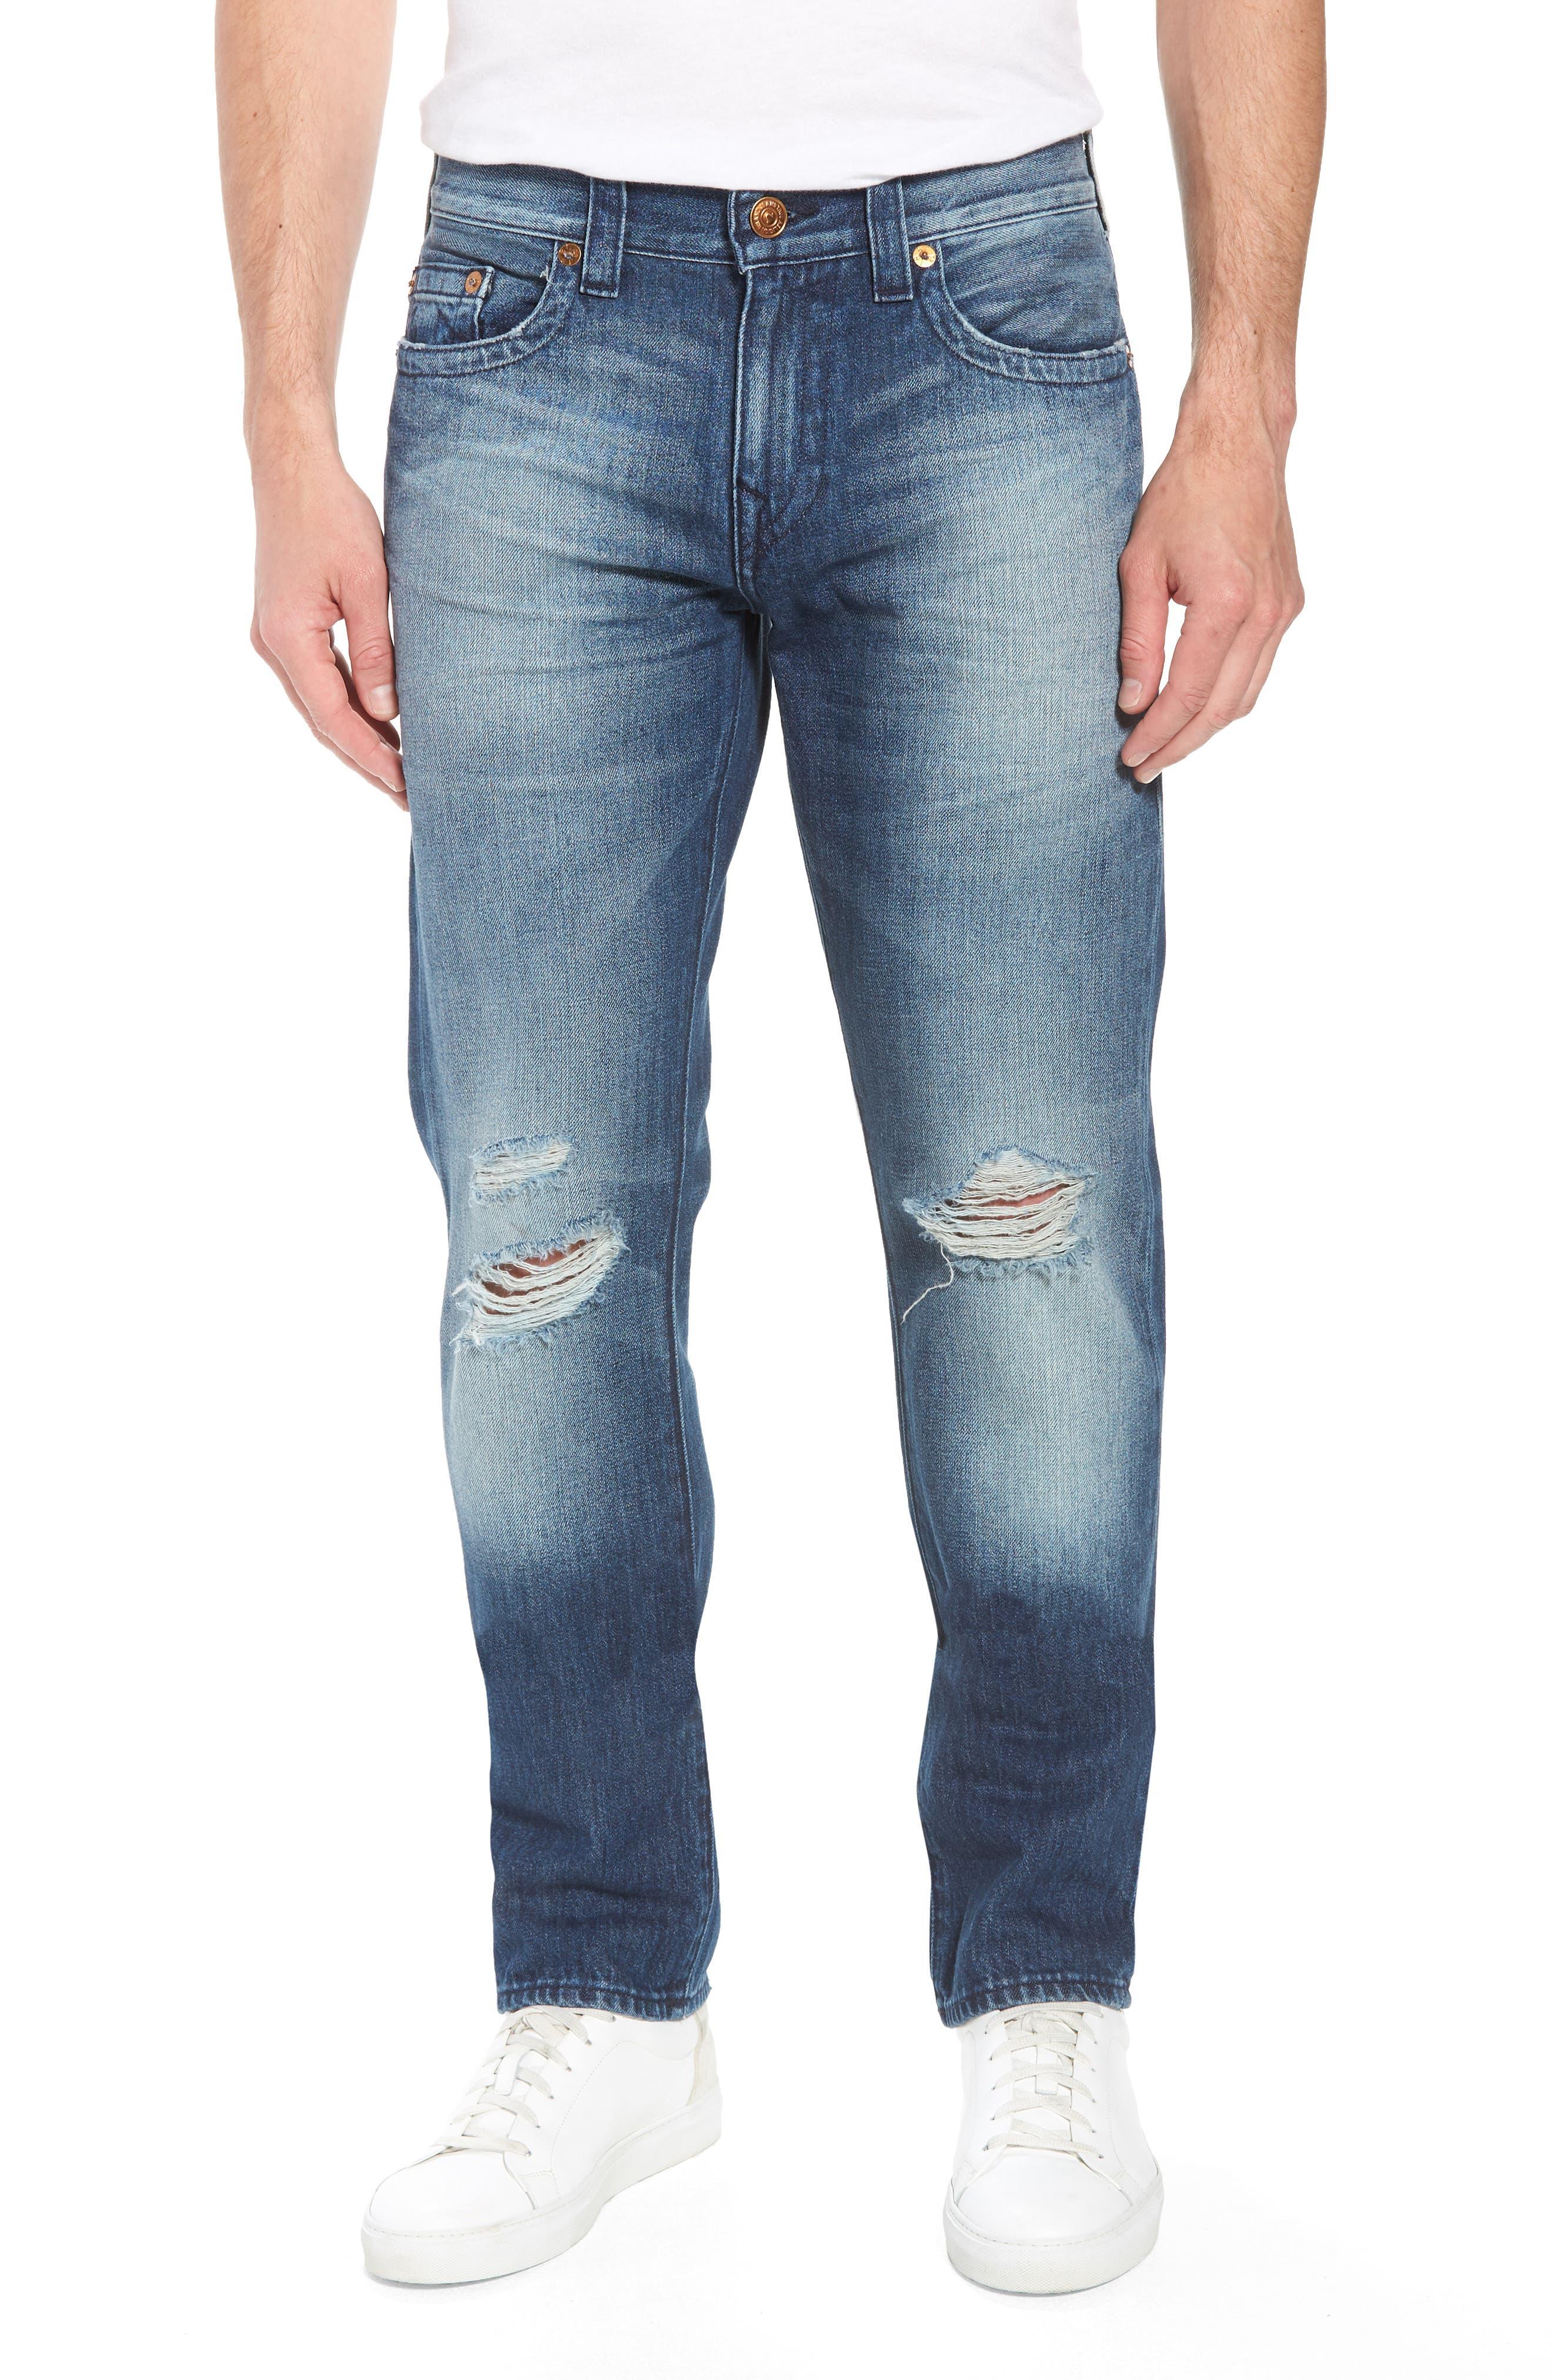 Geno Straight Leg Jeans,                             Main thumbnail 1, color,                             Worn Suspect